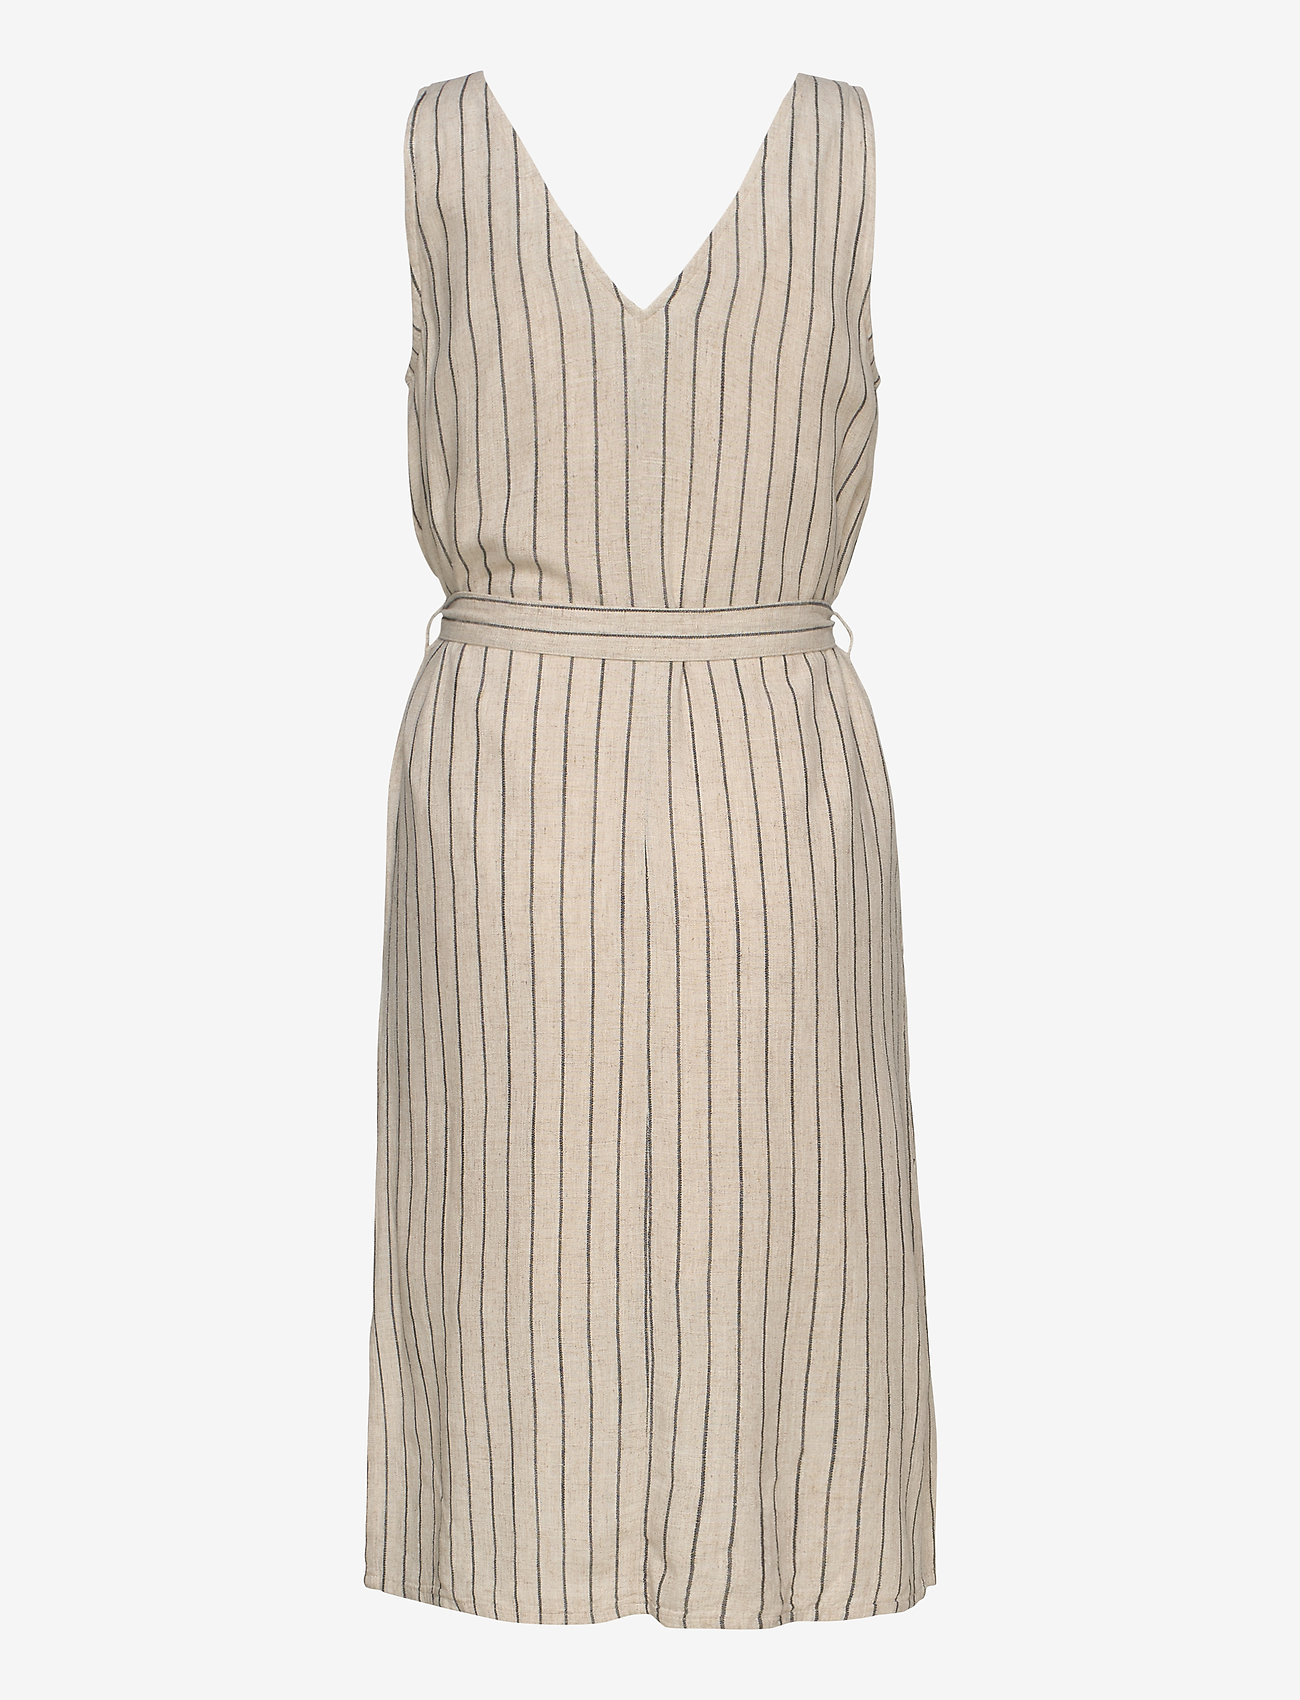 Dresses Light Woven (Sand 4) (629.99 kr) - Esprit Casual